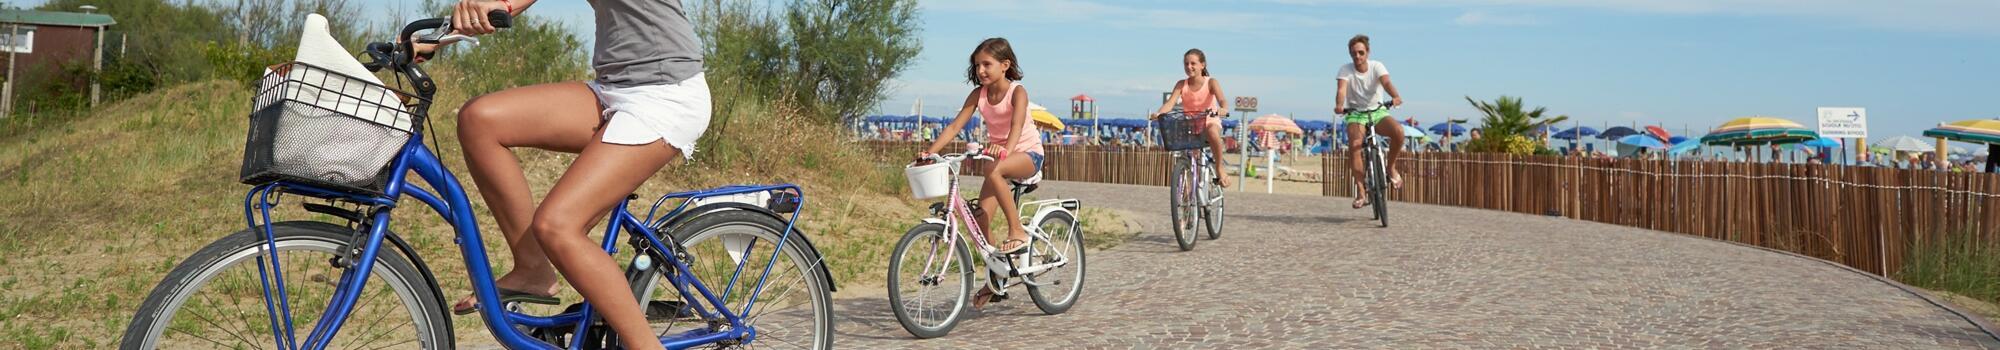 Capalonga Experience: CYCLING